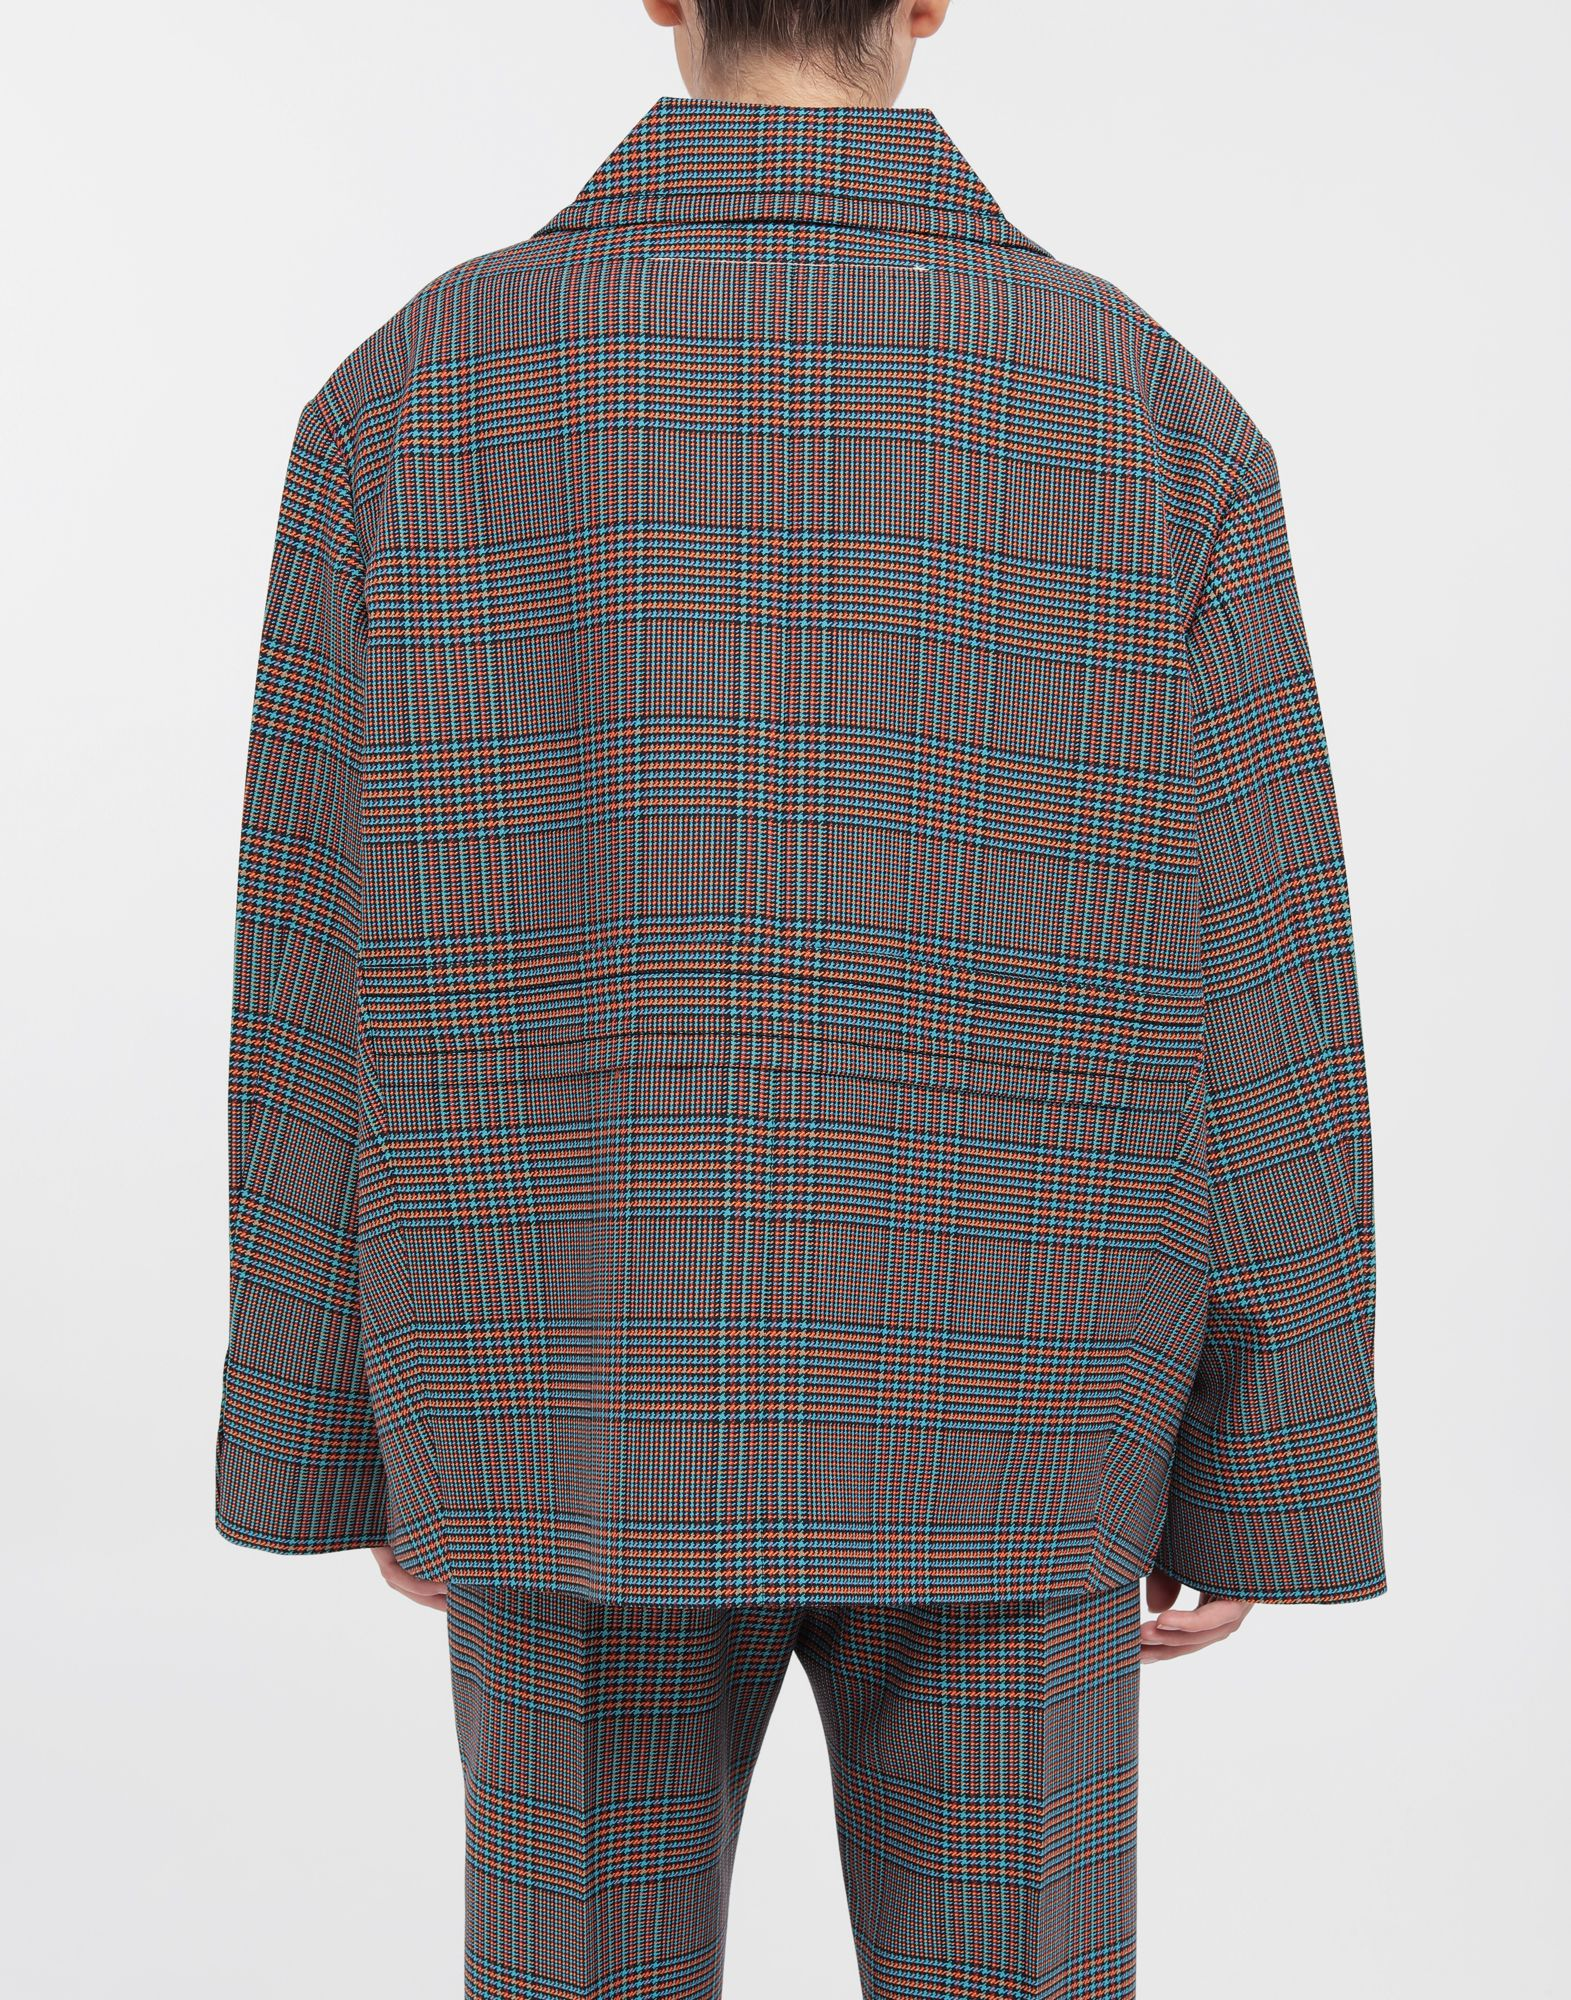 MM6 MAISON MARGIELA Oversized checked wool jacket Blazer Woman e